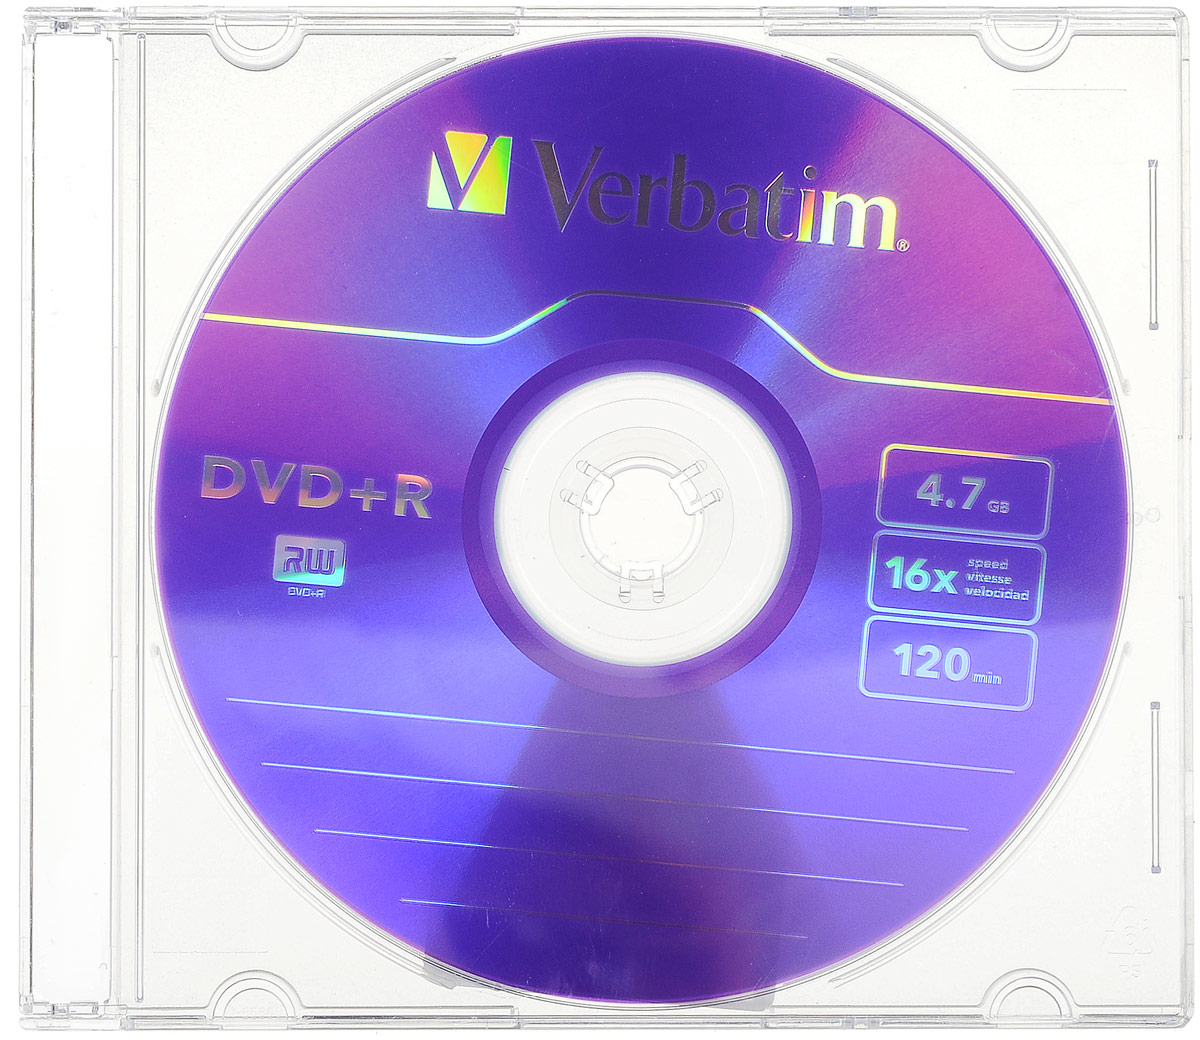 Verbatim DVD+R 4.7Gb 16x, 1 шт verbatim 500gb 53070